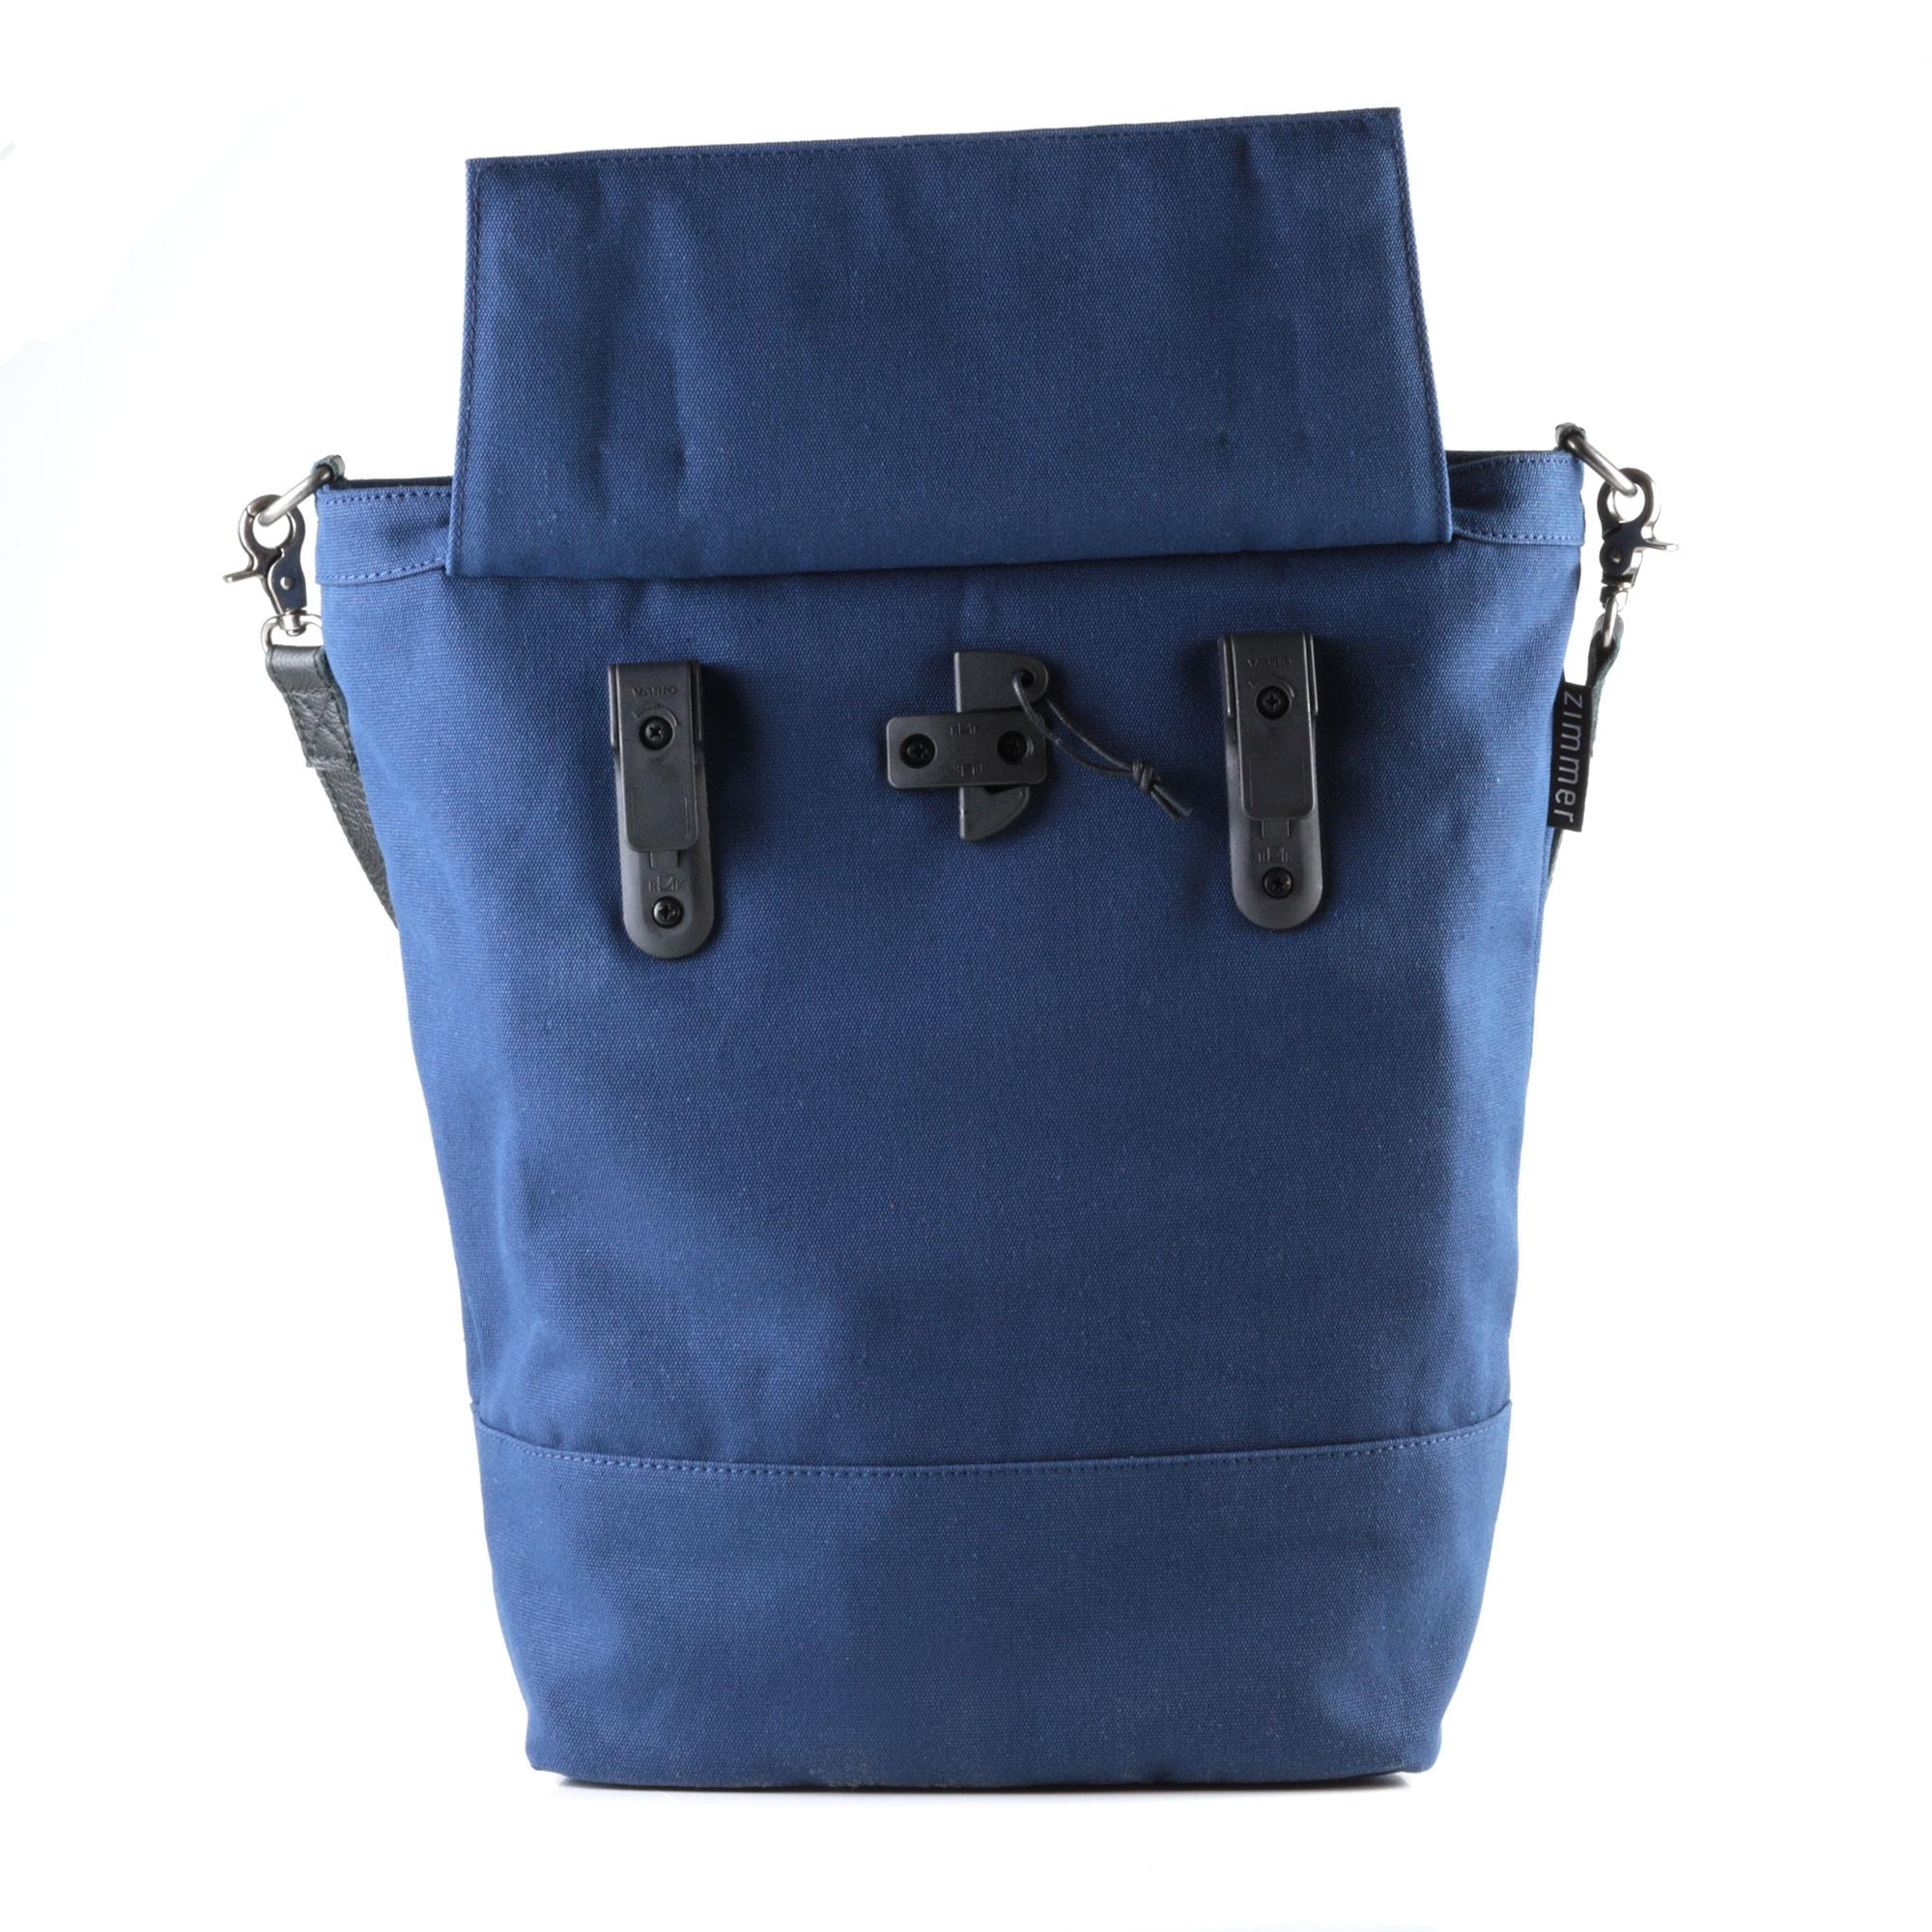 radtasche montreal blau hinten offen